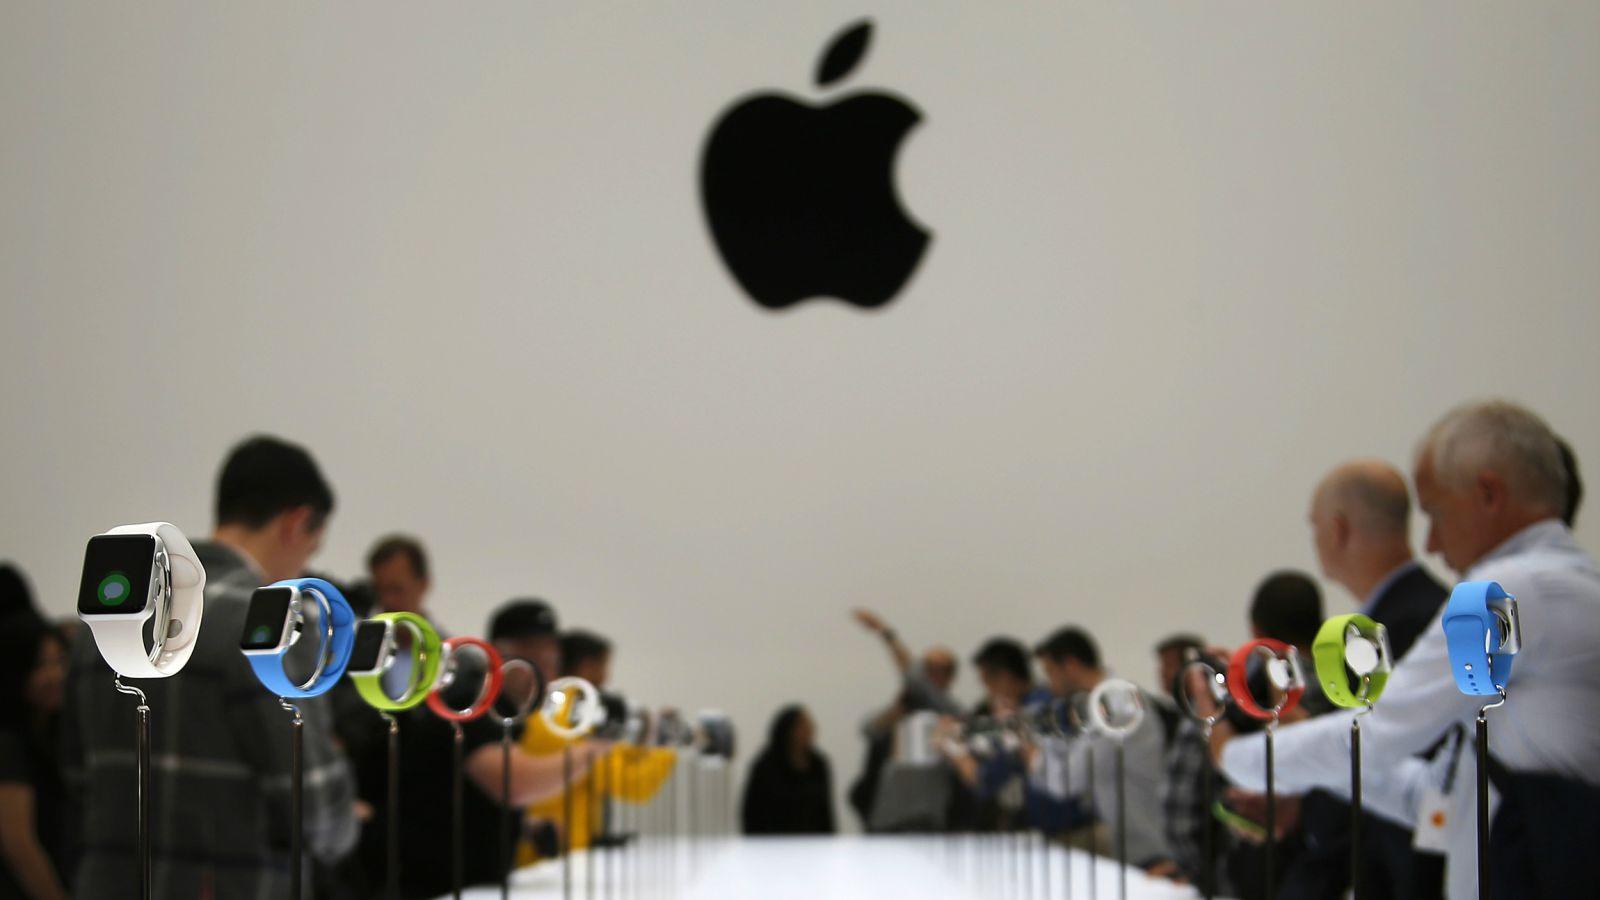 Apple Watch surpassed sales of the original iPhone